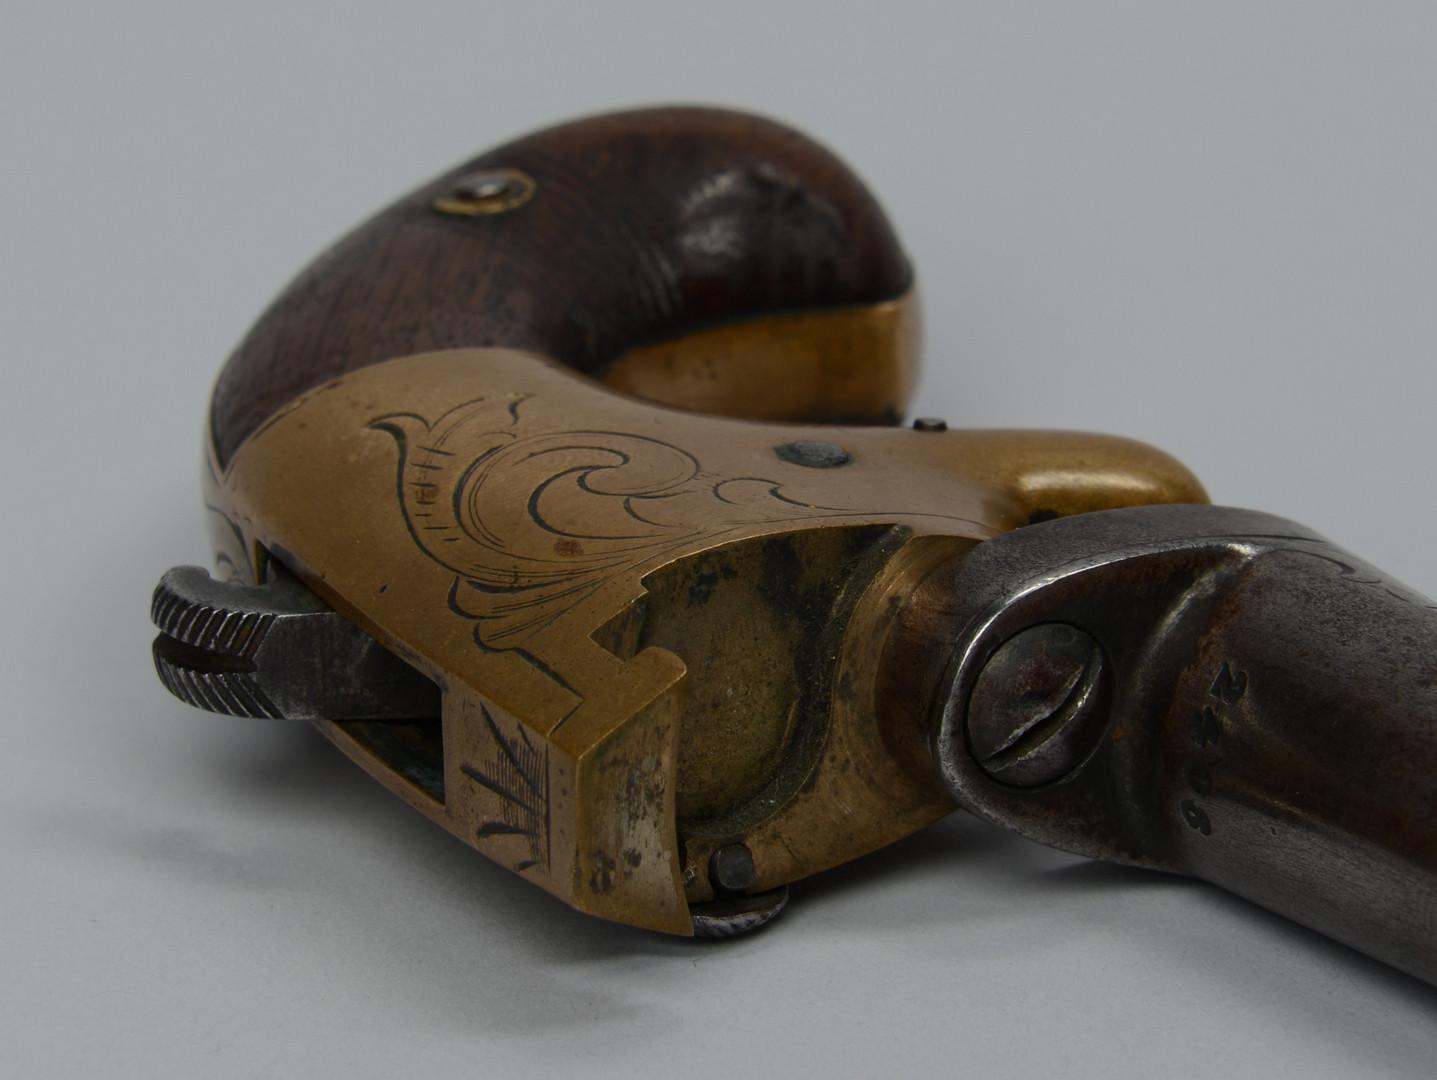 Lot 393: National Arms Co. No. 2 Deringer Pistol